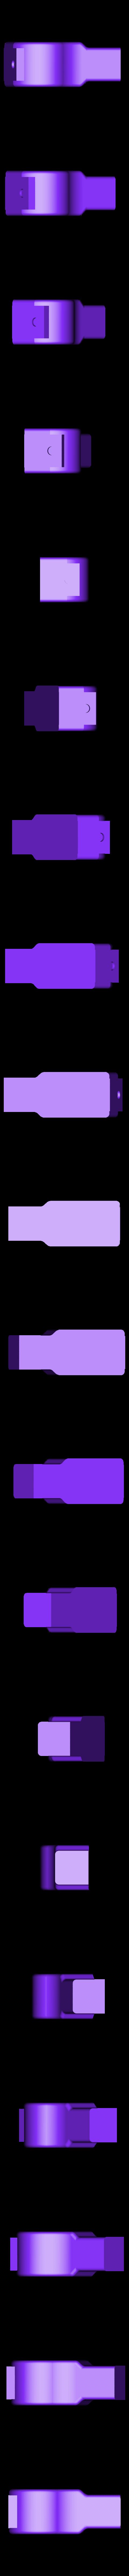 Block_Base_Main.STL Download free STL file Tractor • 3D print object, wally3Dprinter